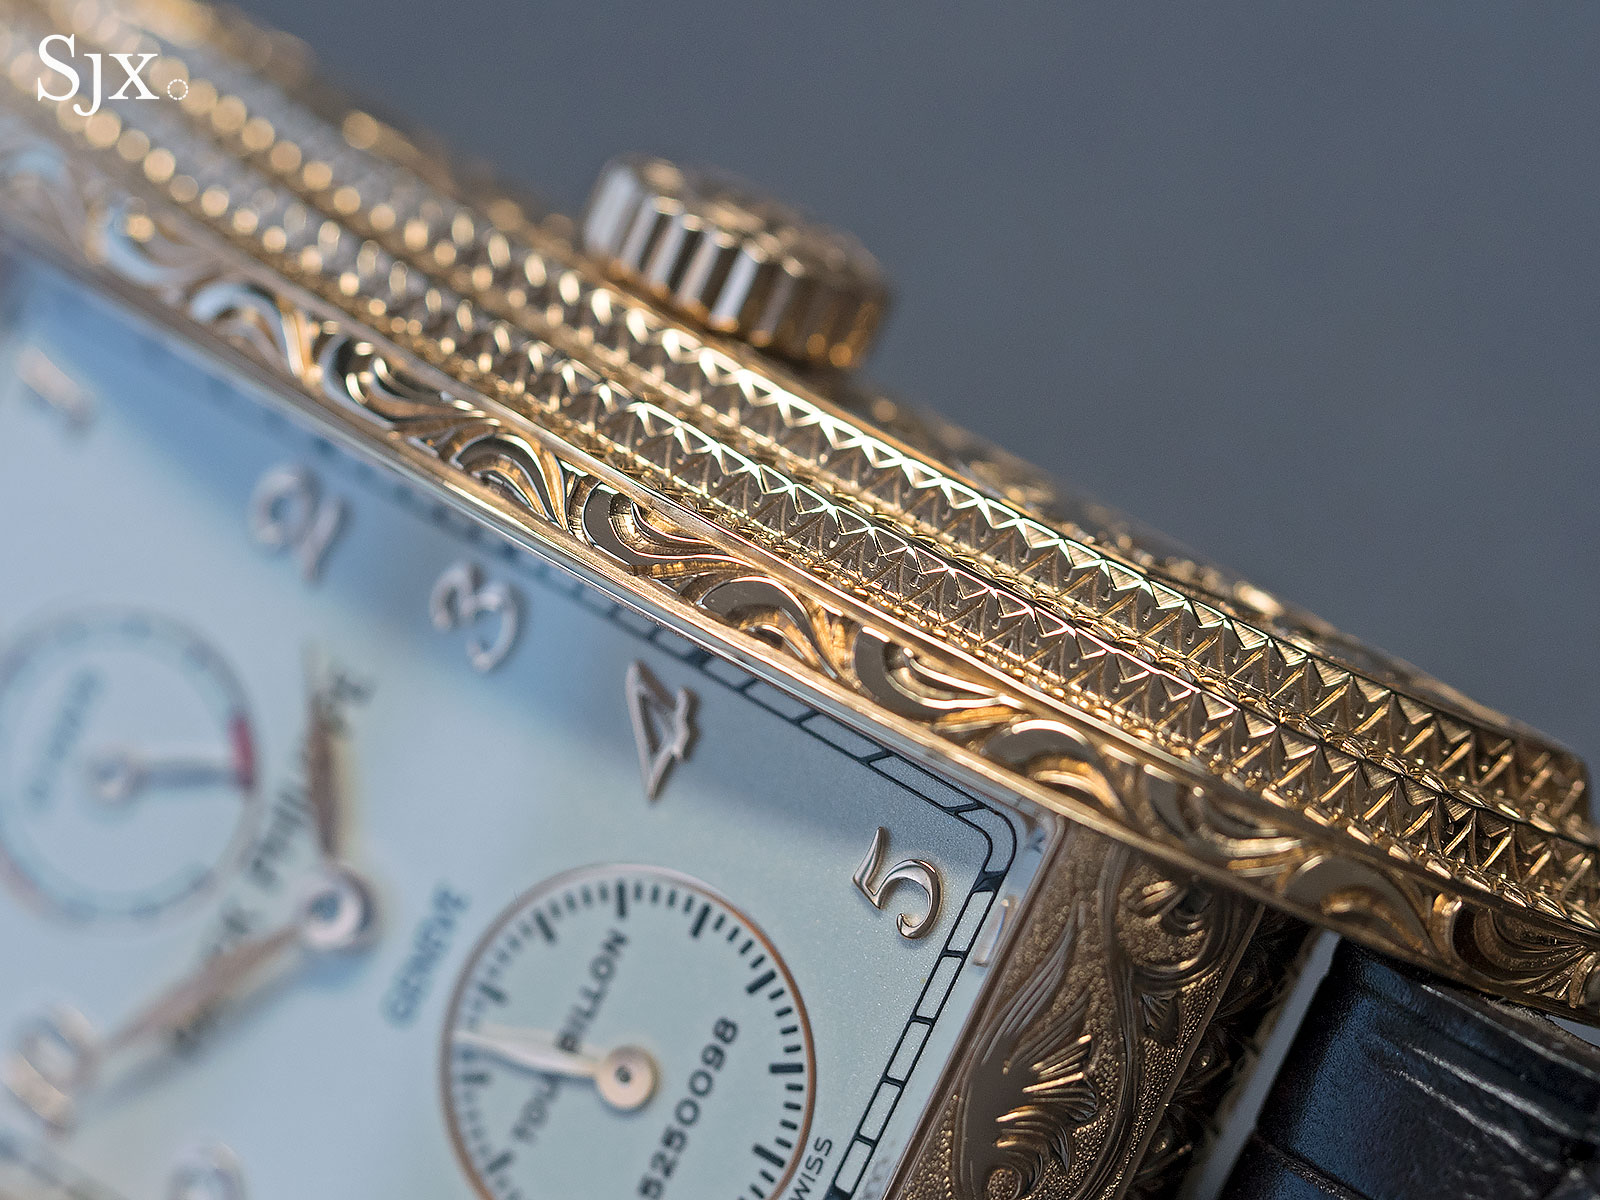 Patek Philippe Tourbillon Rare Handcrafts ref. 5101-5